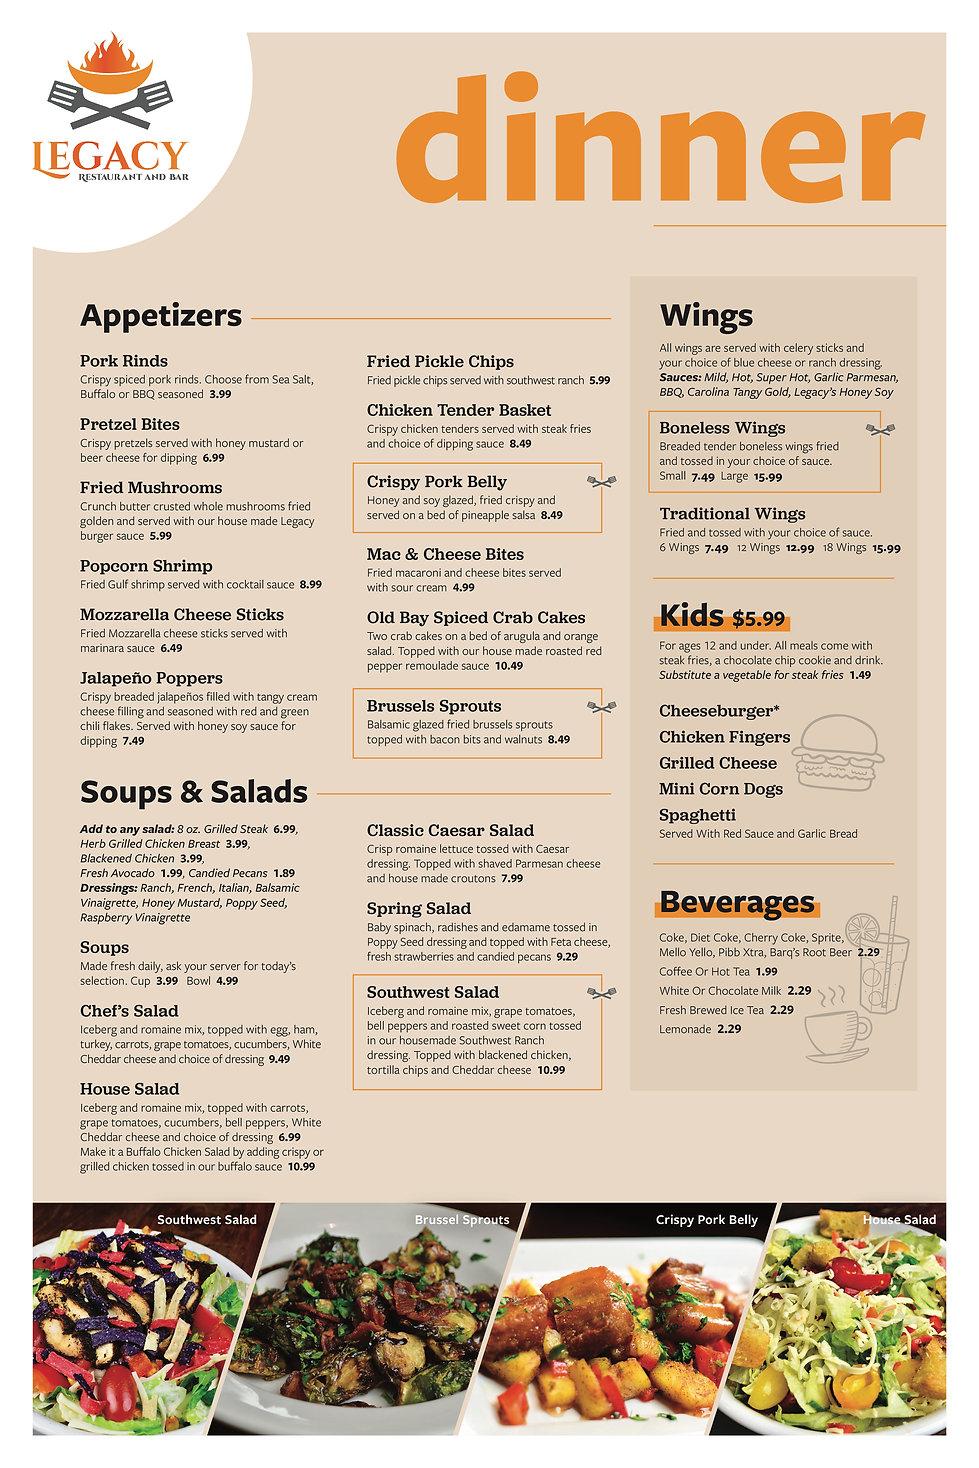 Legacy Dinner A.jpg